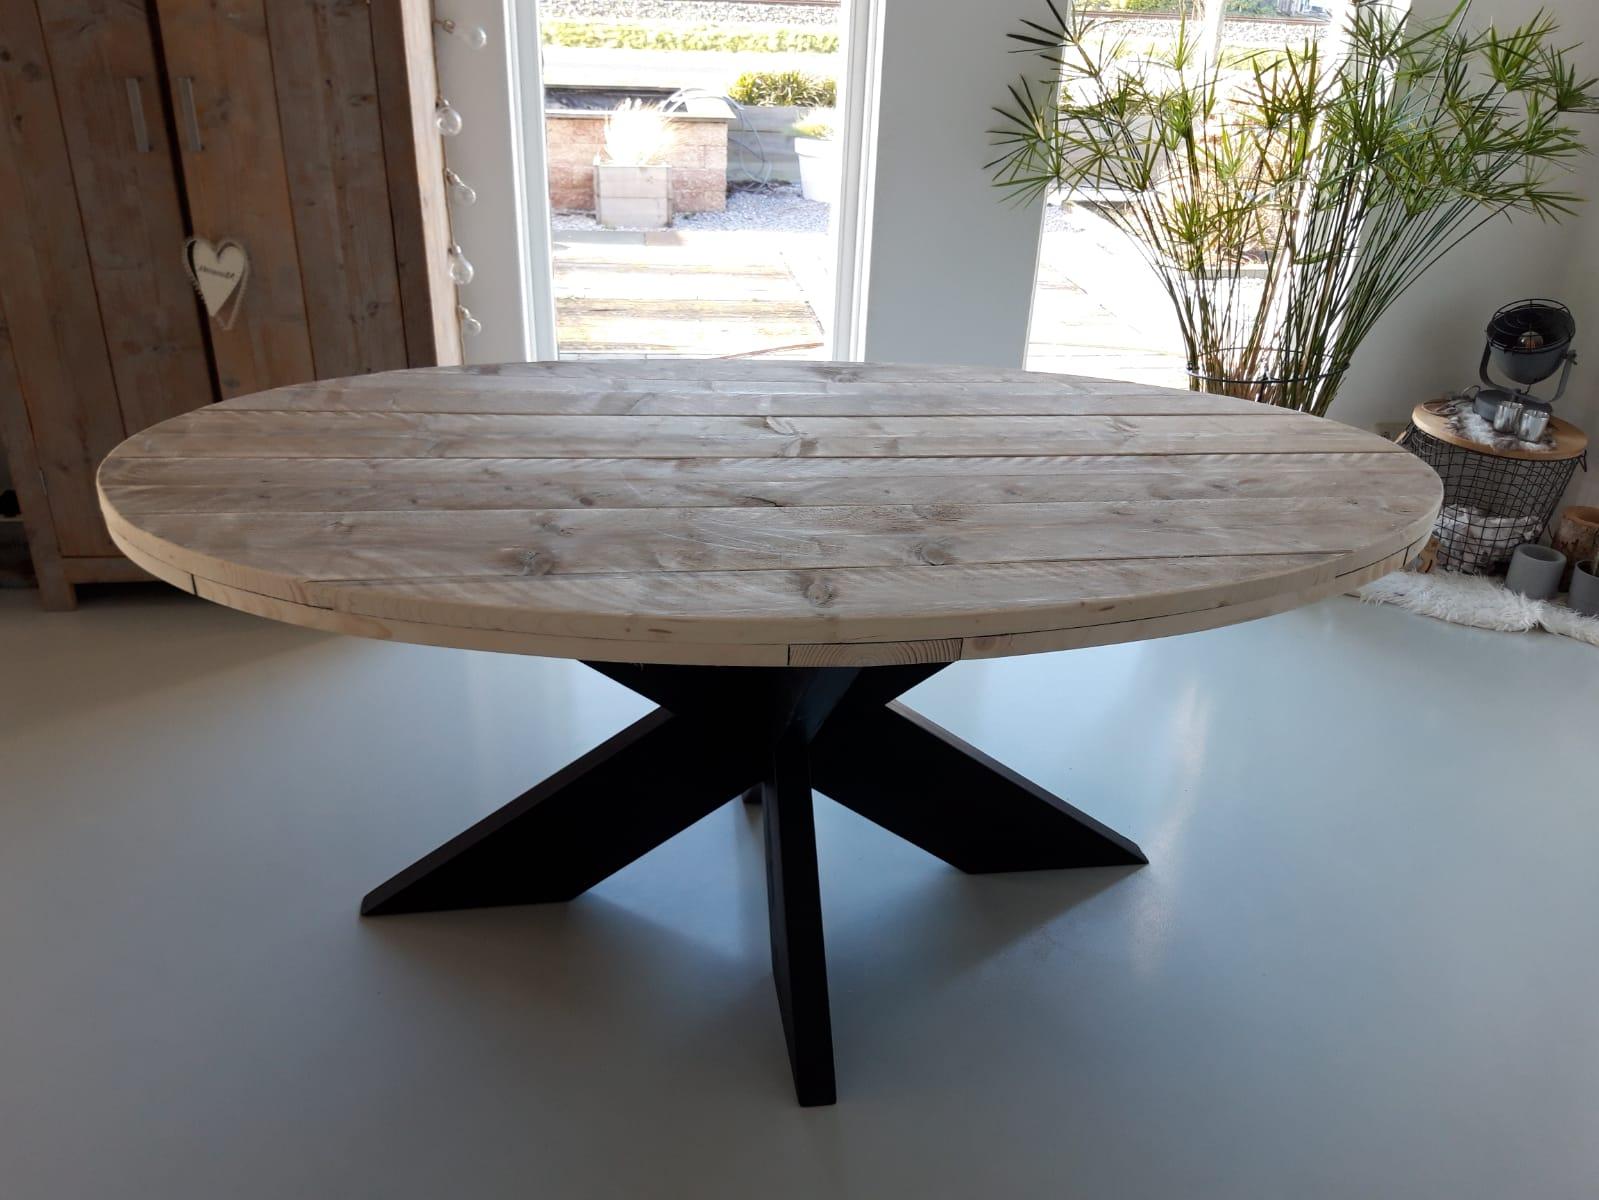 ovale-tafel-steigerhout-met-zwarte-kruispoot-mat-1-190x100